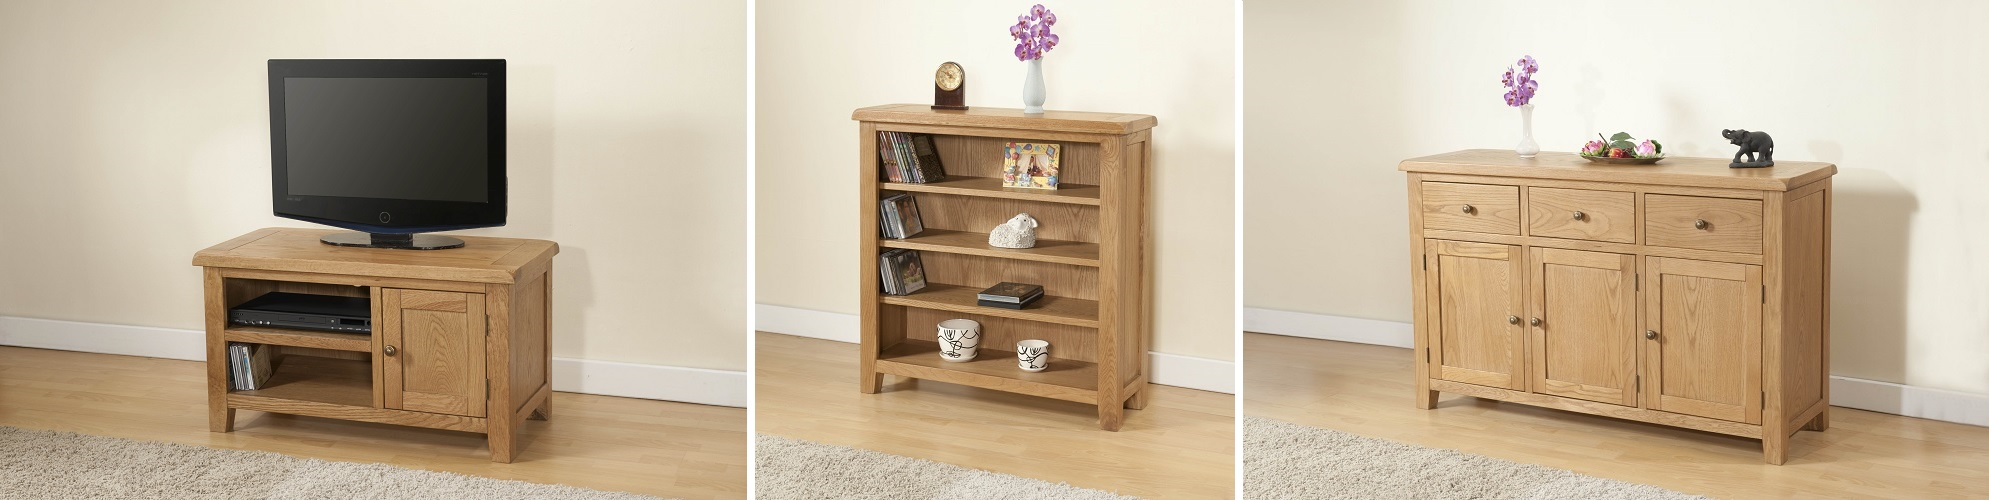 Cotswold rustic light oak living room furniture oak furniture uk for Living room furniture ranges